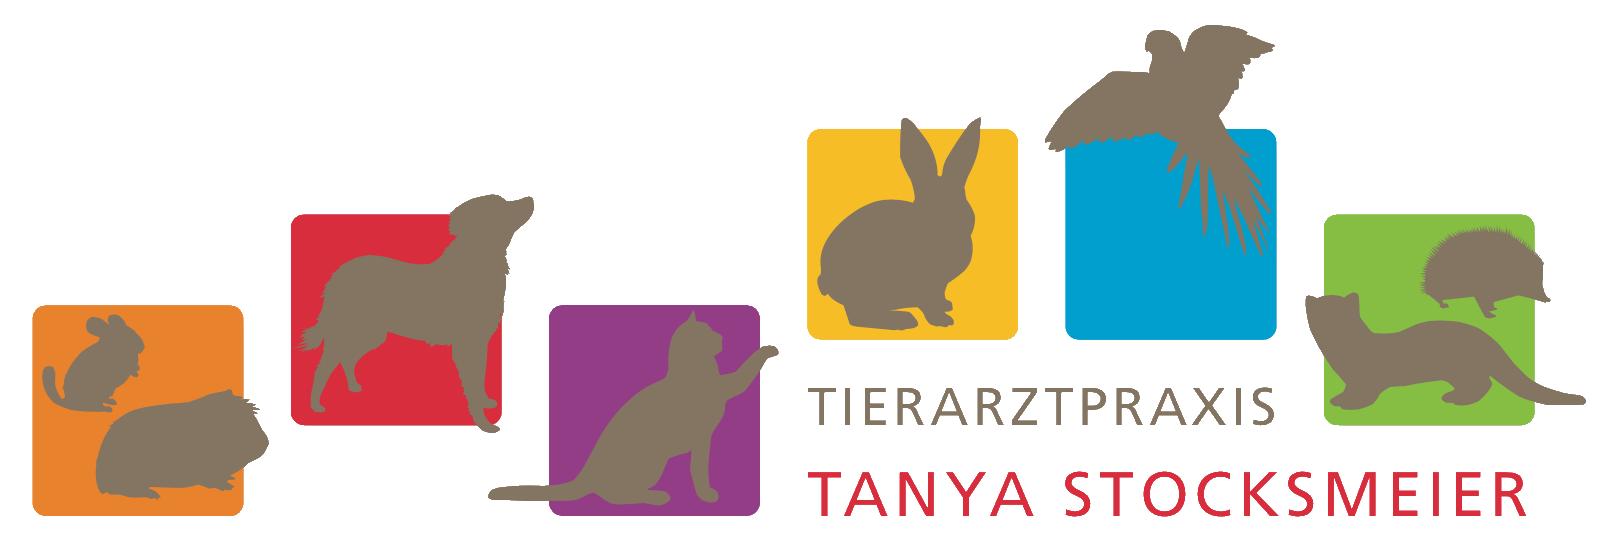 Tierarztpraxis Tanya Stocksmeier